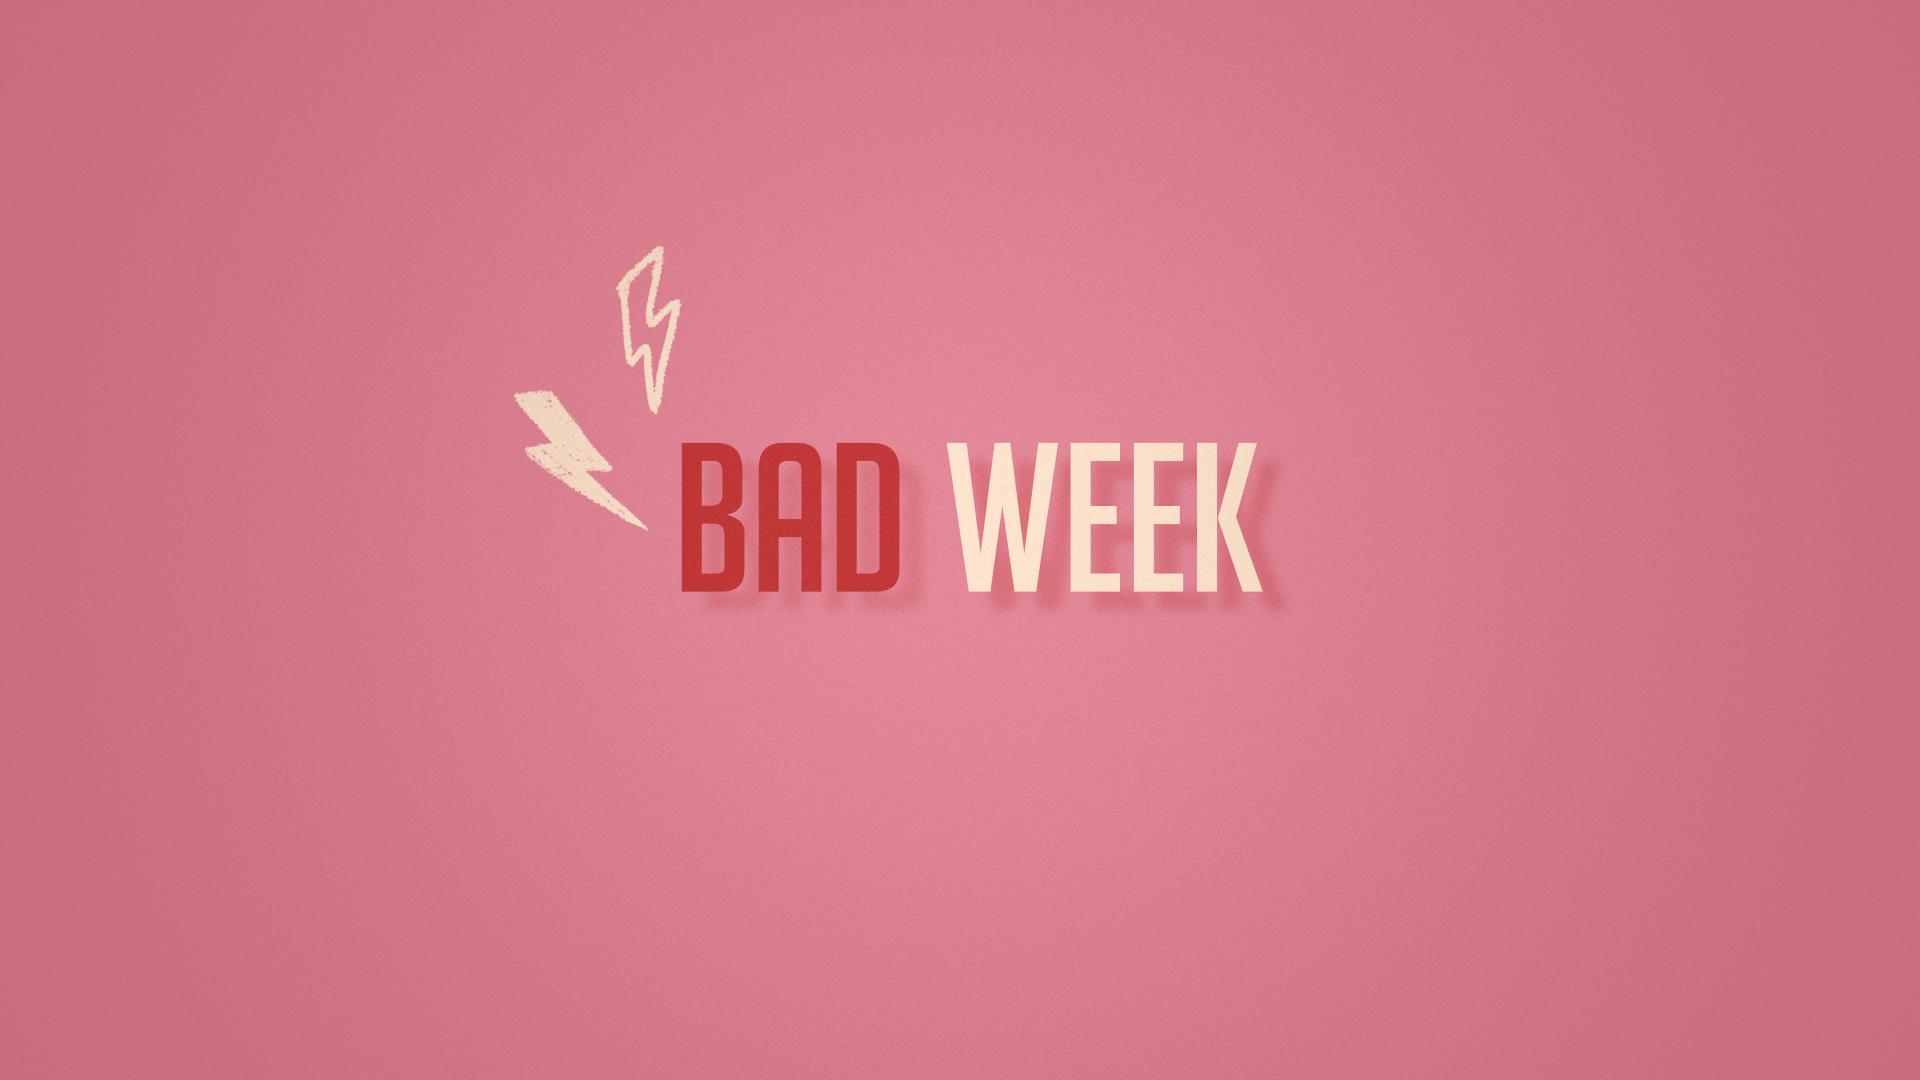 LadyGang_Styleframes_GBWK_OPTION5-BAD_01 (0-00-00-00).jpg